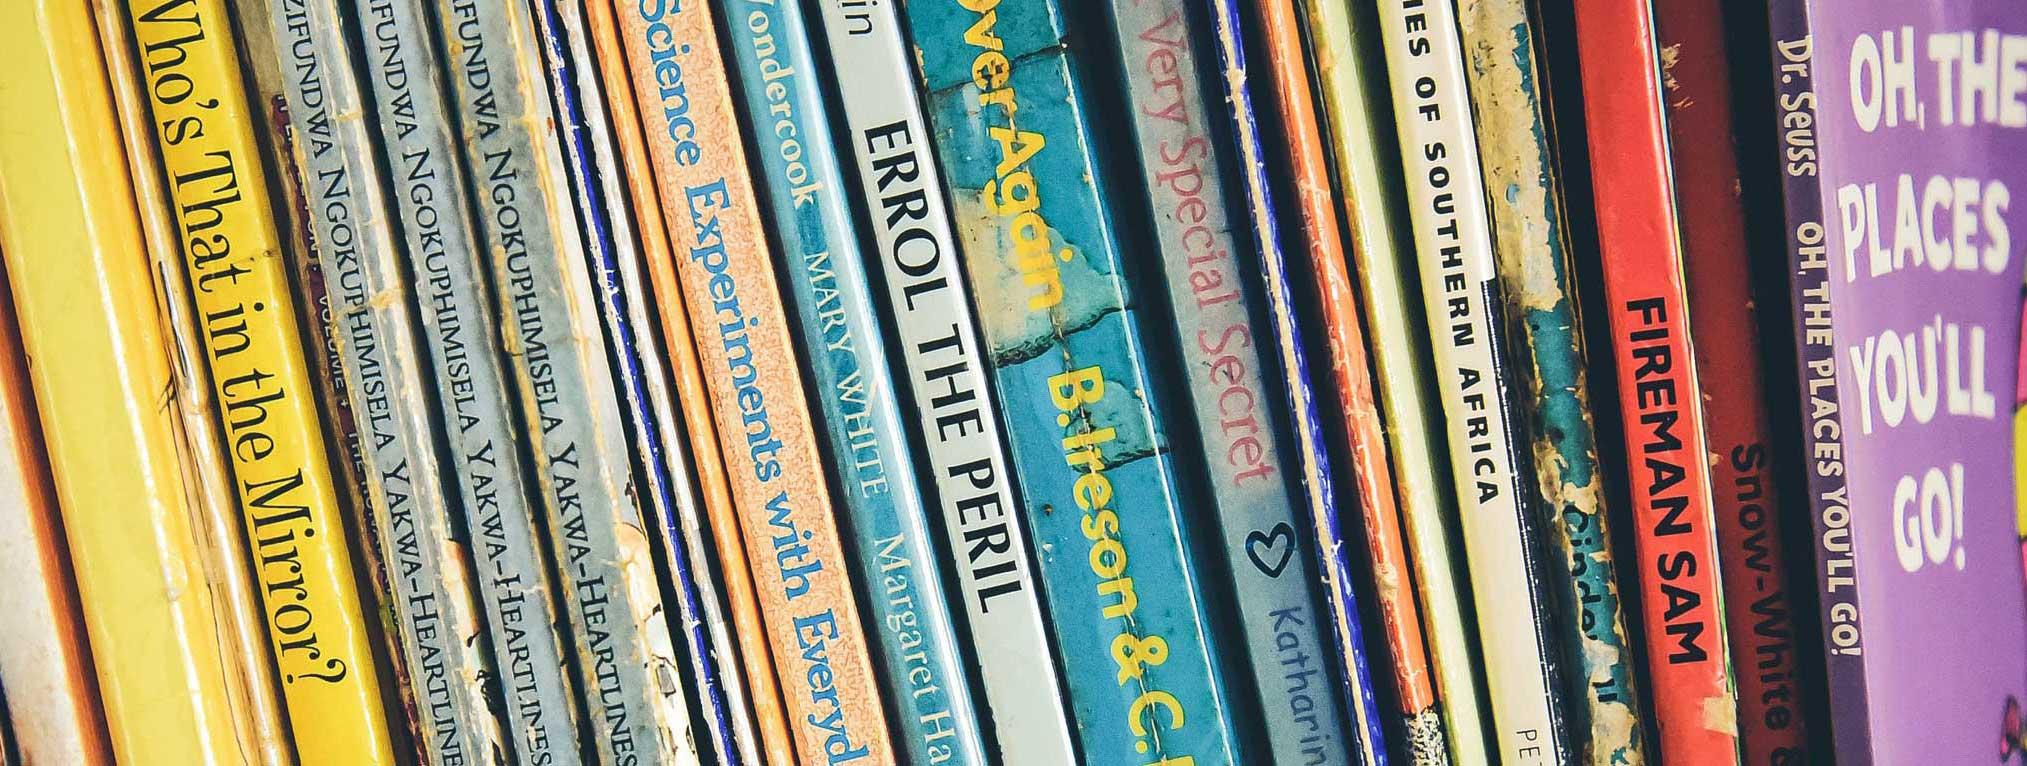 wjs staff hero image. A row of children's books on bookshelf